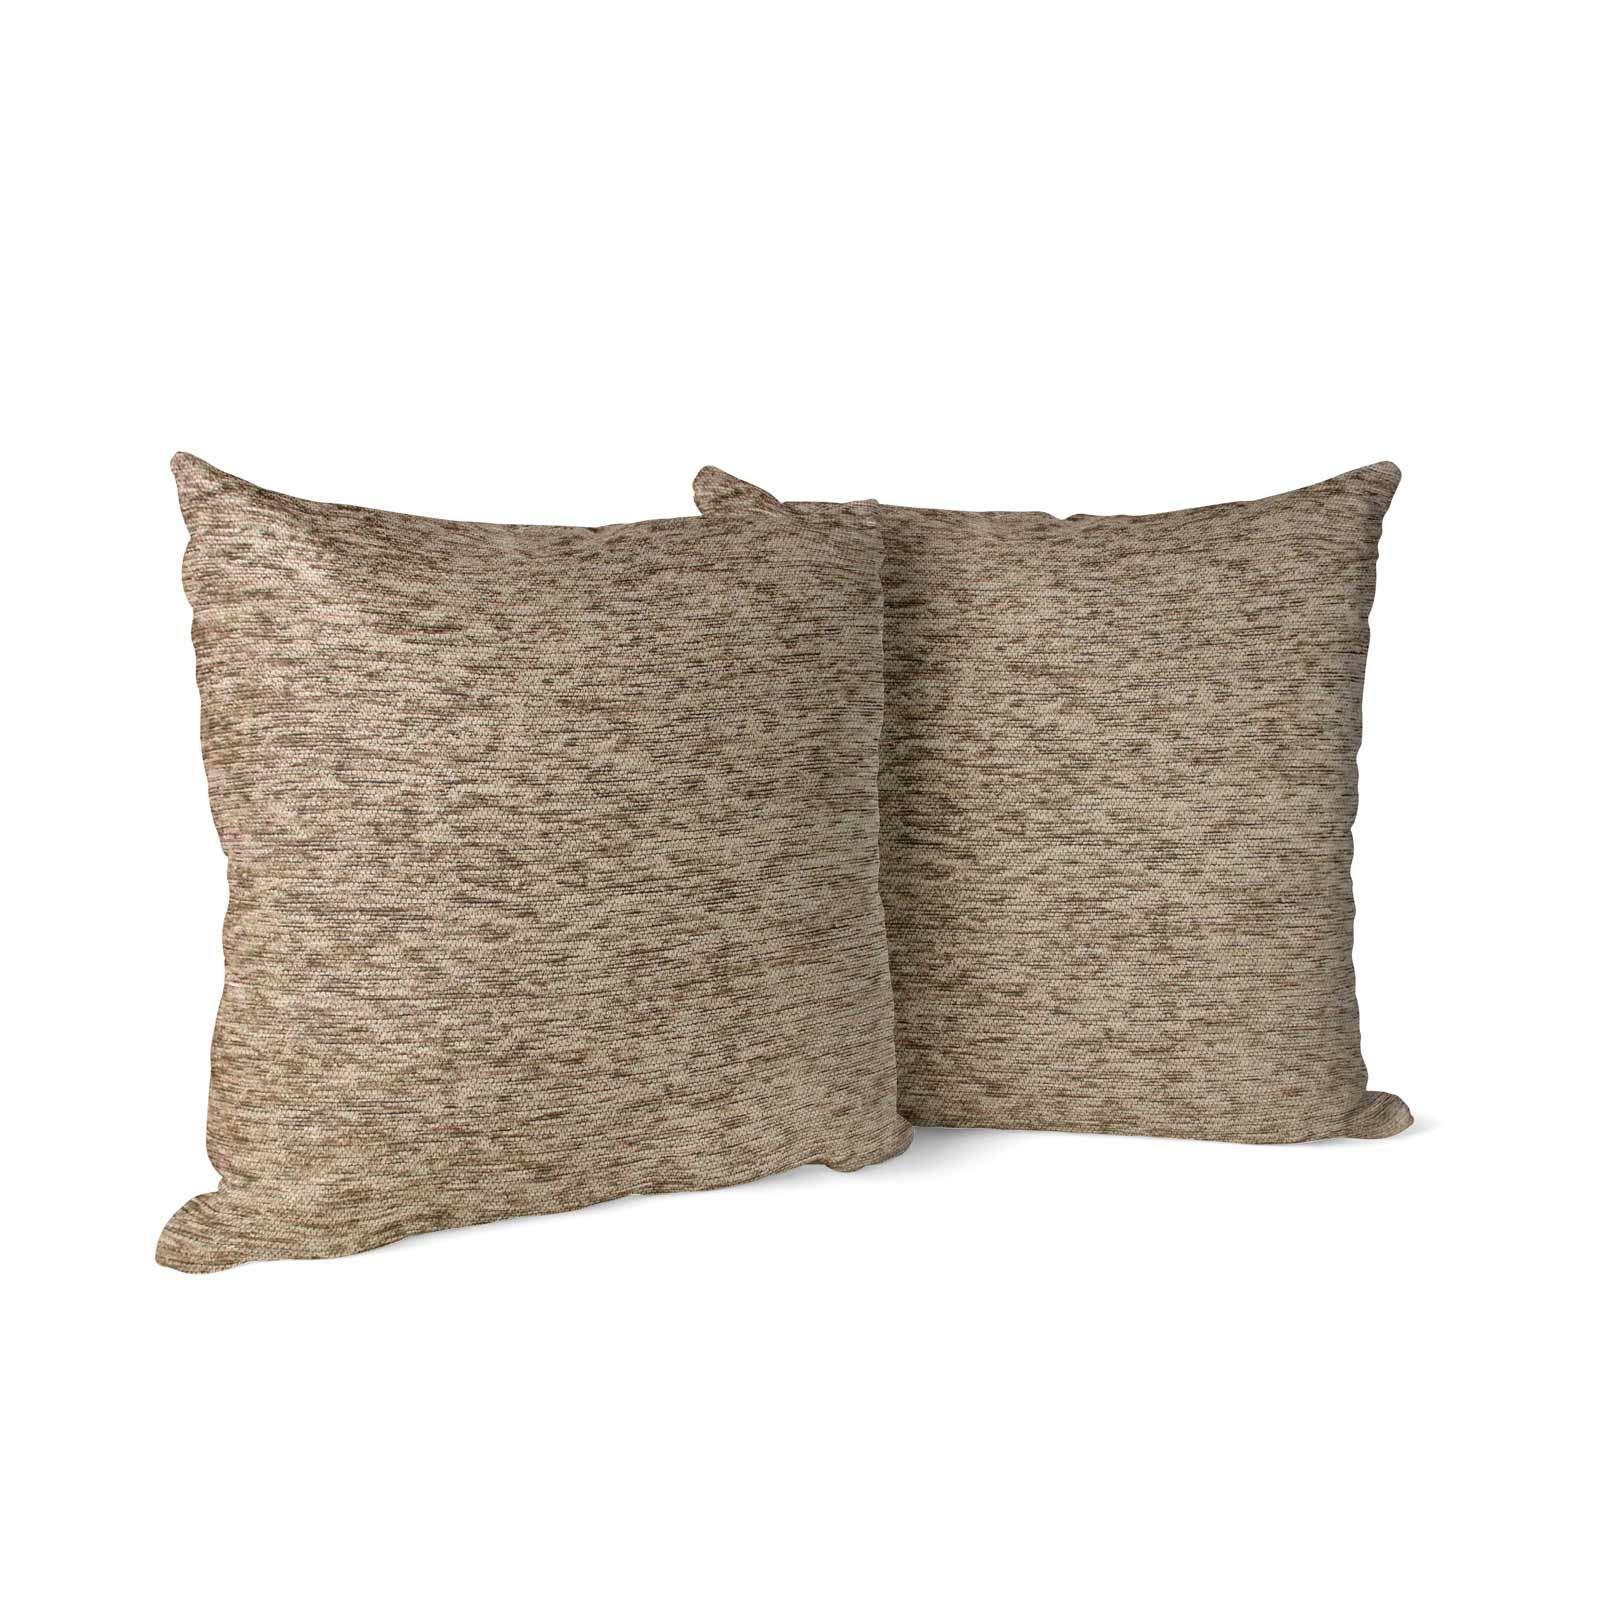 Set-of-2-Chenille-Cushion-Covers-Luxury-Plain-Cushions-Cover-Pairs-18-034-x-18-034 thumbnail 40